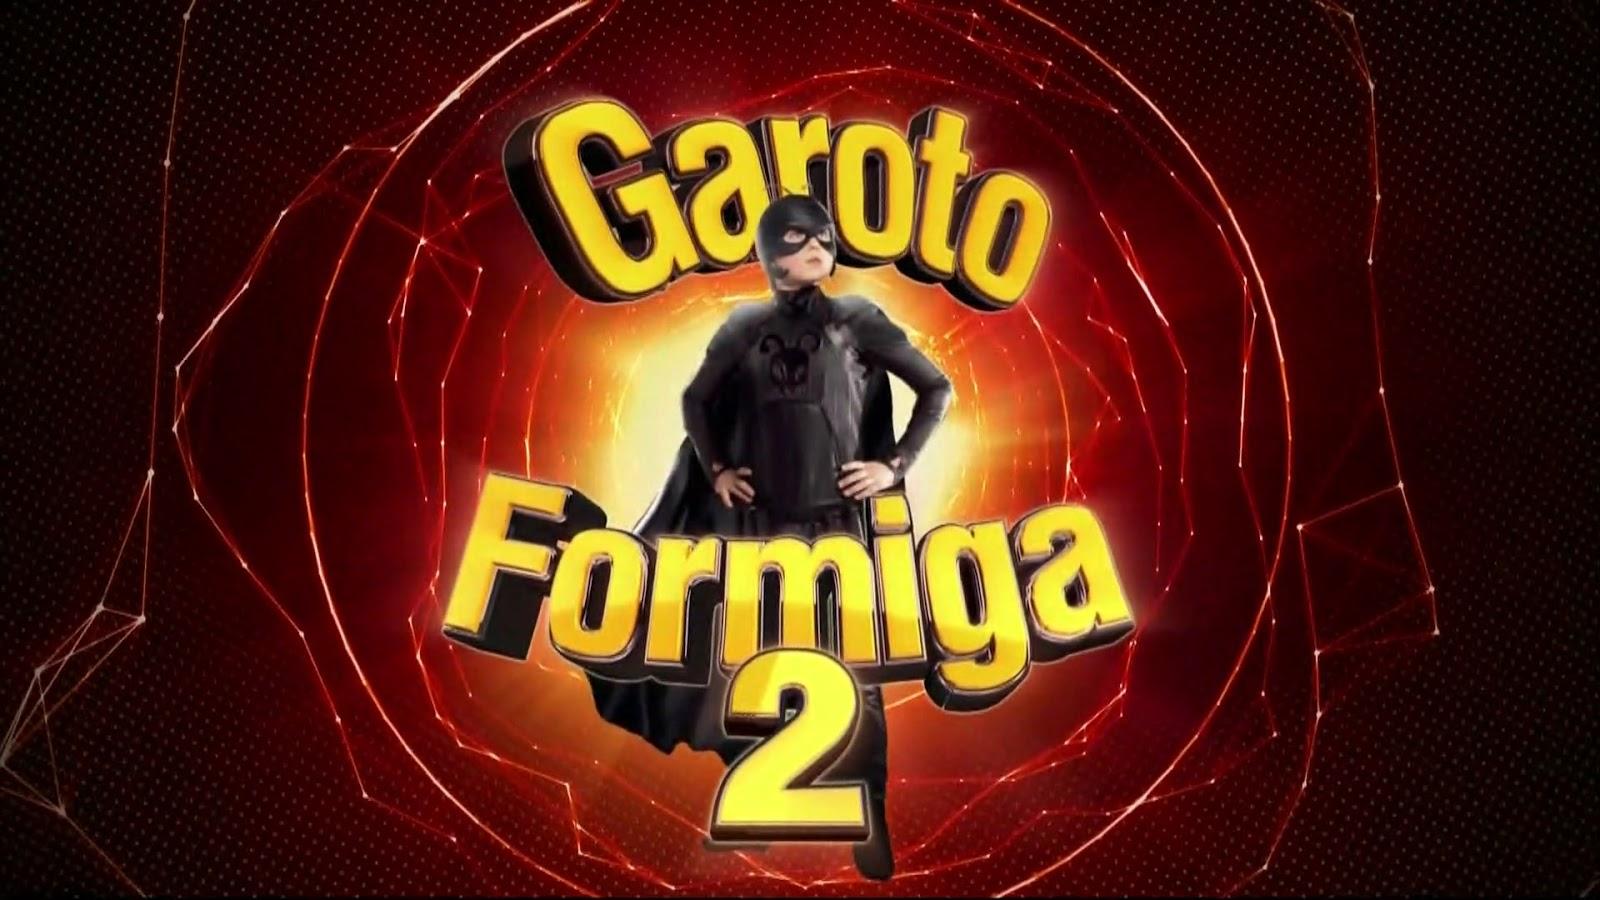 Imagens Garoto-Formiga 2 Torrent Dublado 1080p 720p BluRay Download